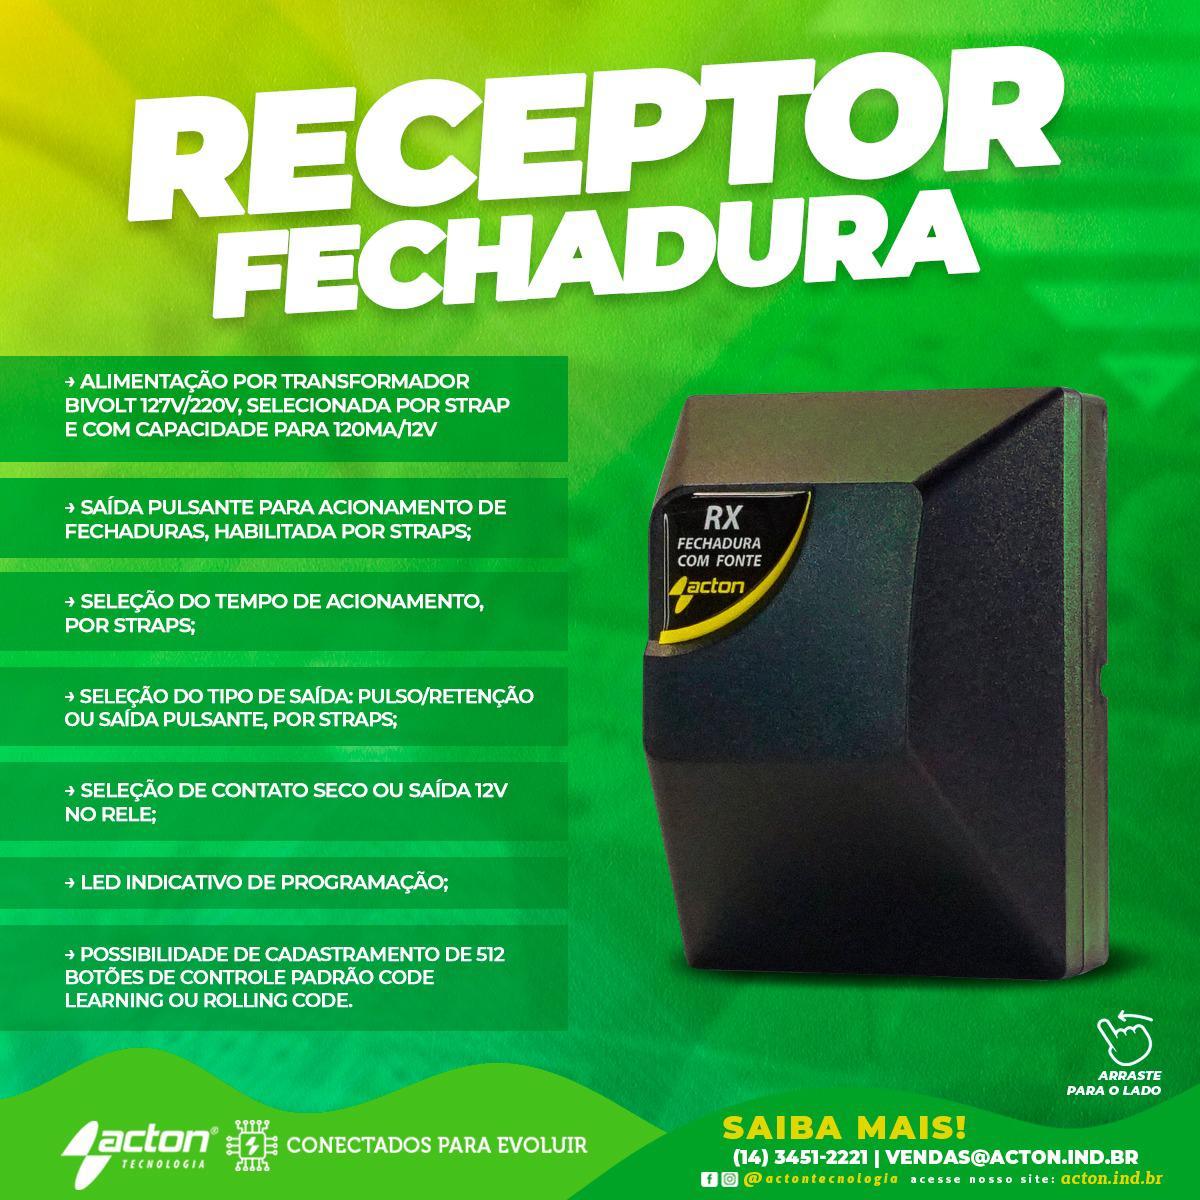 RECEPTOR AC4 FECHADURA